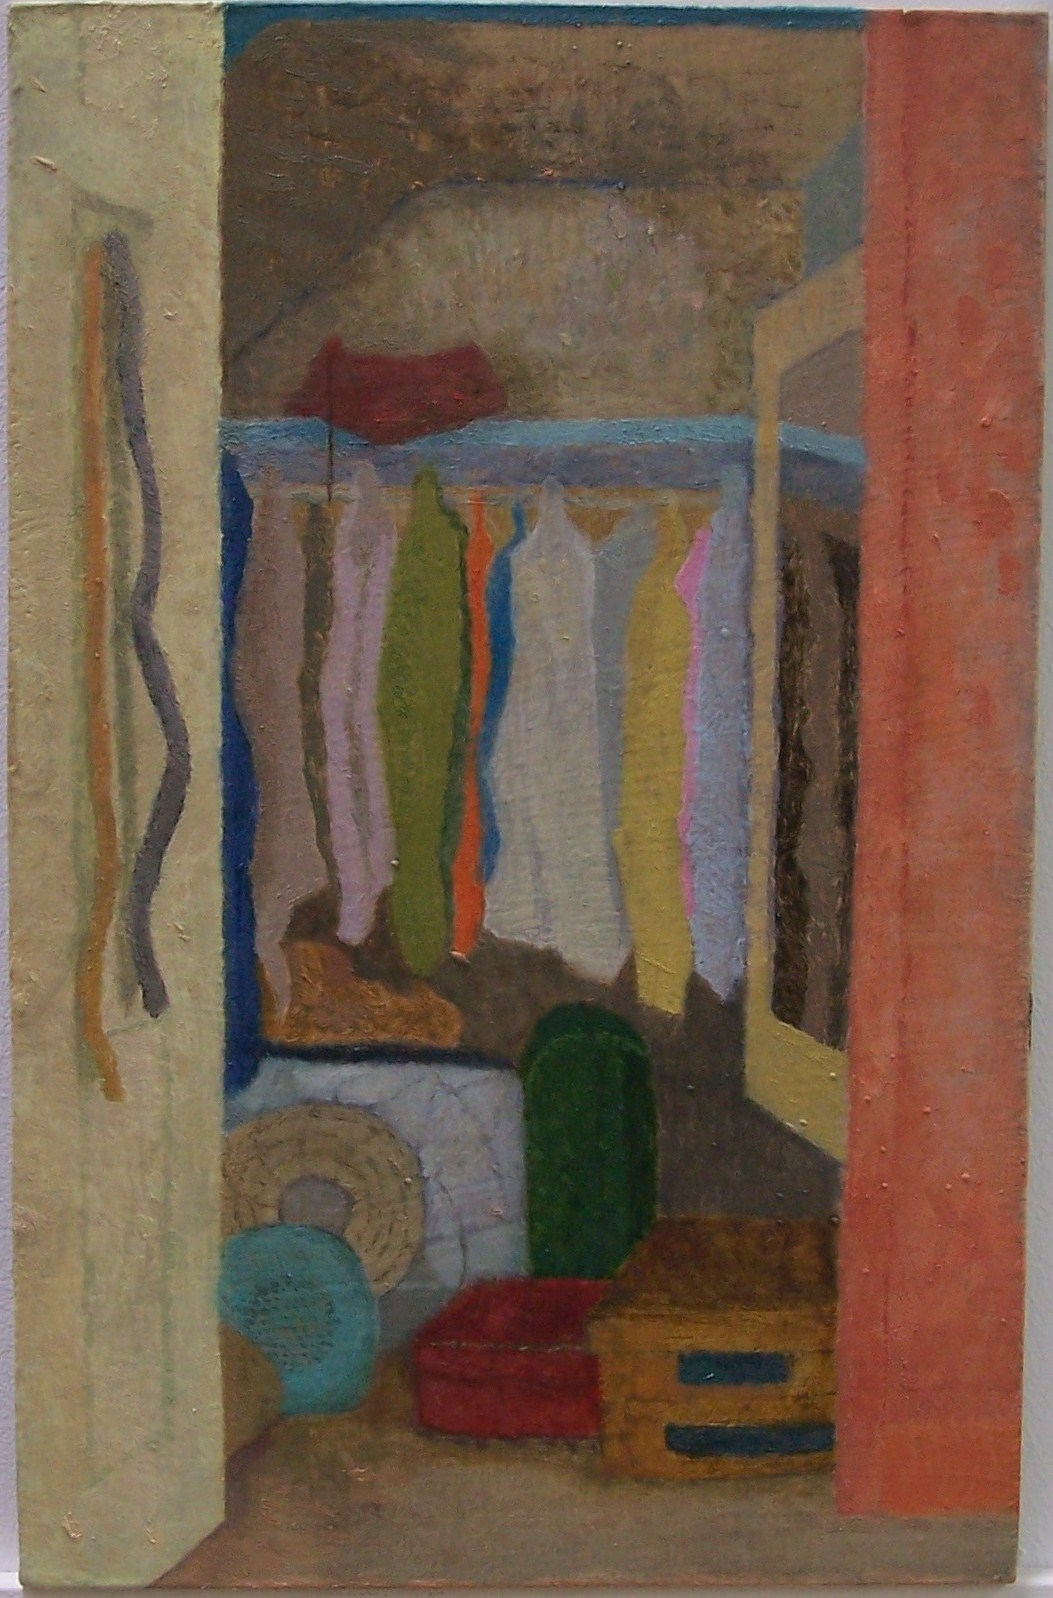 'Interior, wardrobe' 2014, oil on gesso